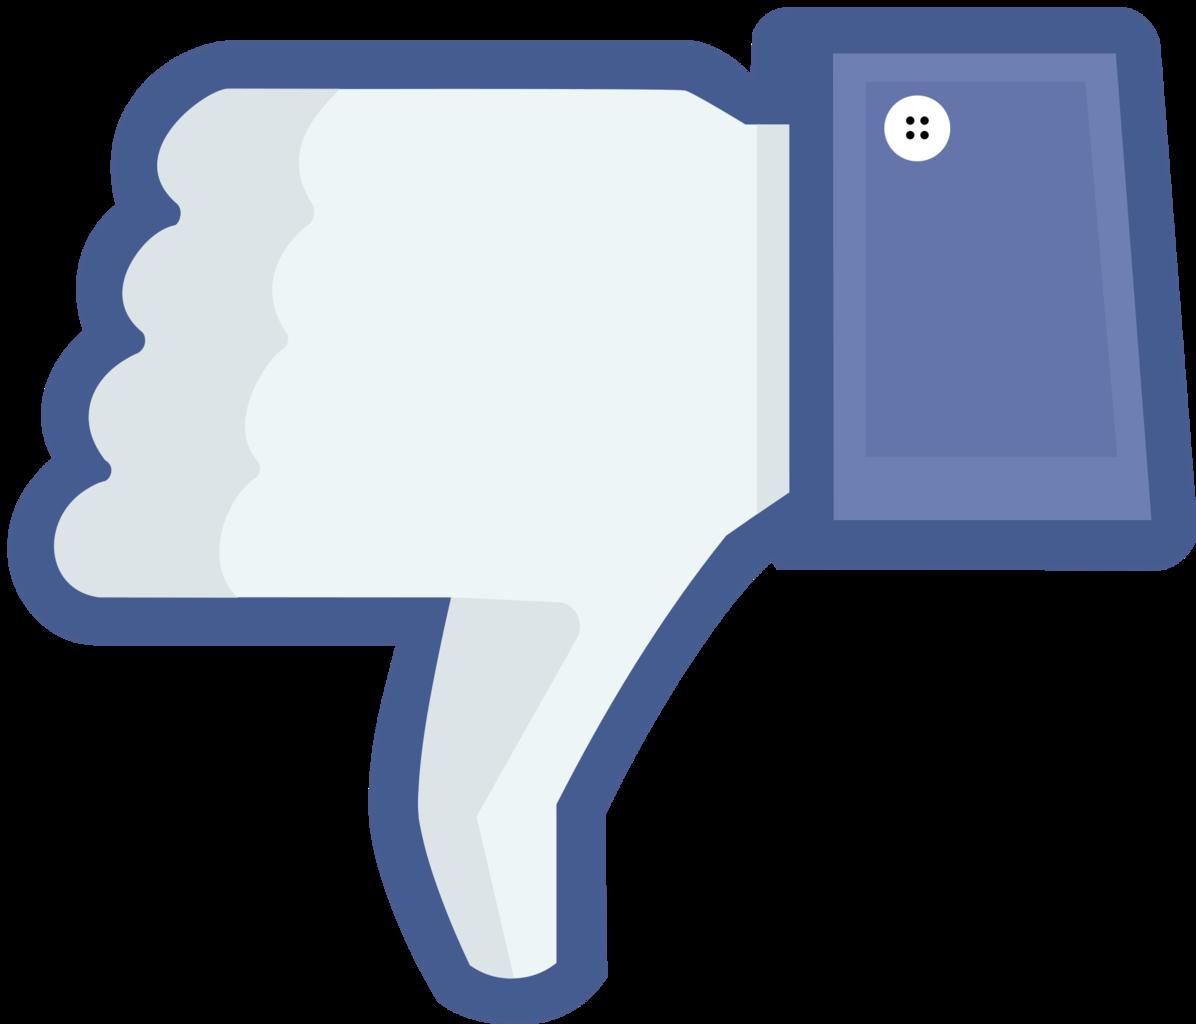 Facebook clipart size clip art freeuse Facebook Thumbs Down Clipart - Clipart Kid clip art freeuse